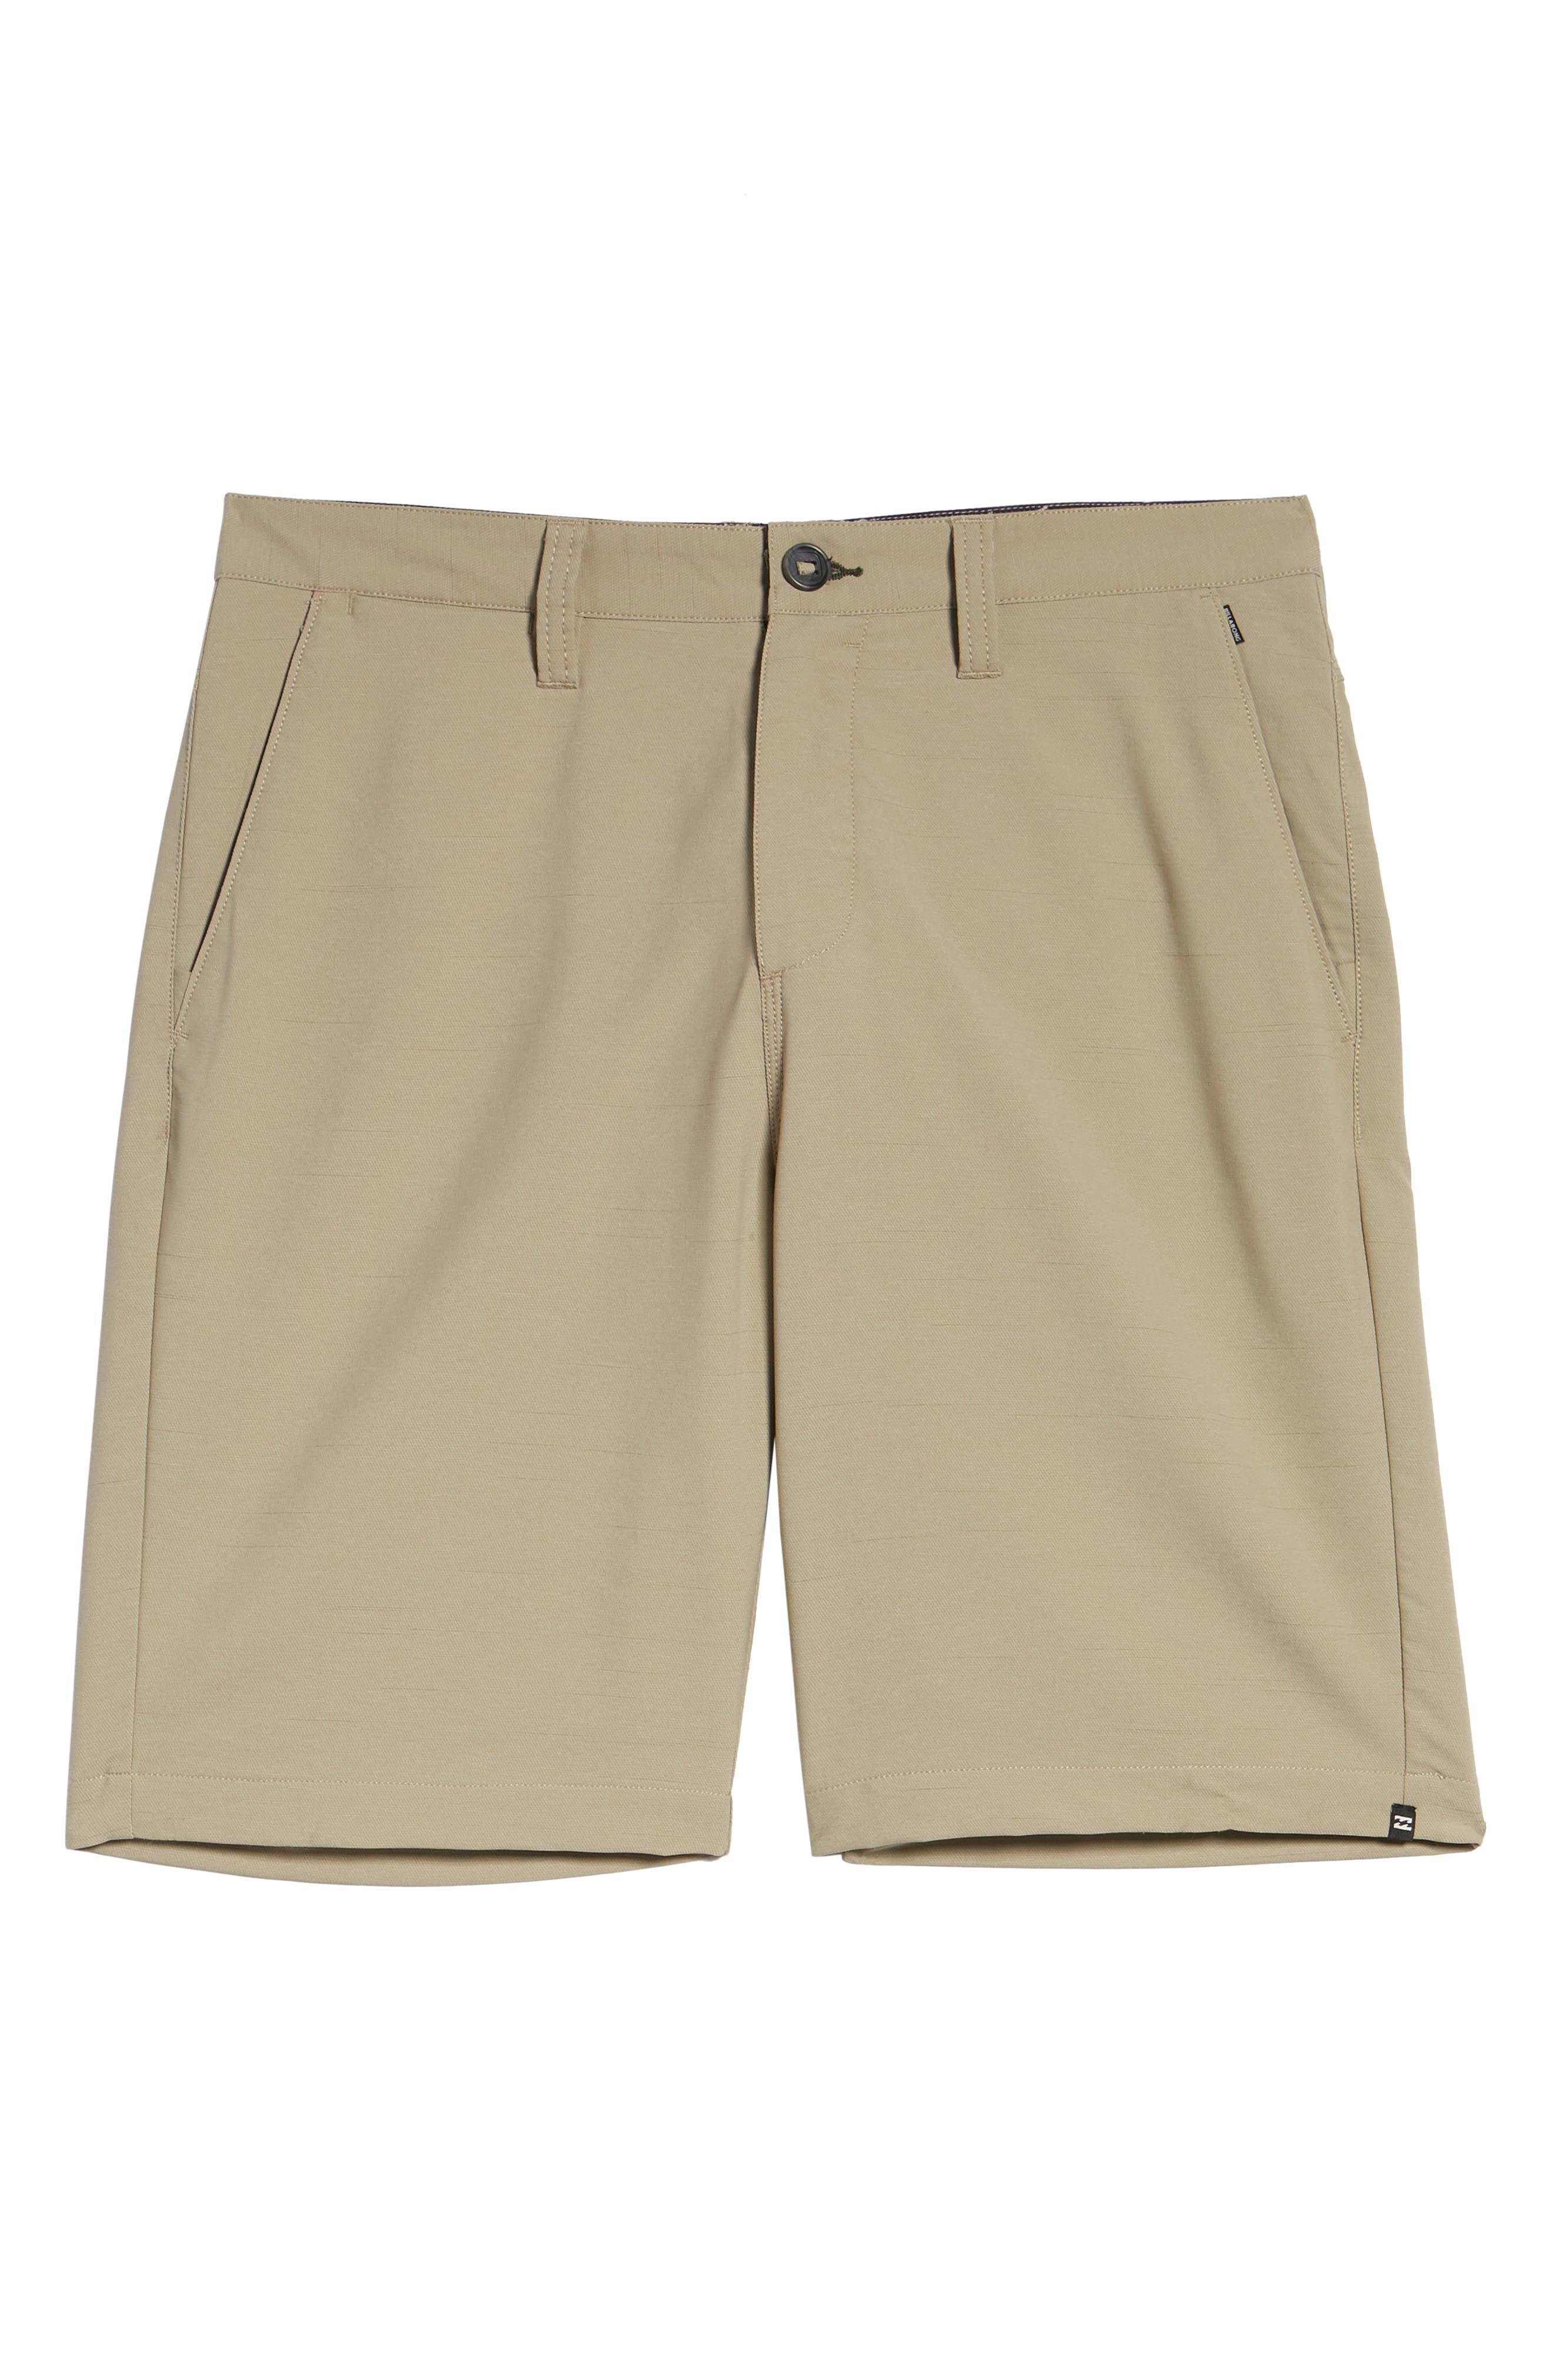 Surfreak Hybrid Shorts,                             Alternate thumbnail 6, color,                             KHAKI